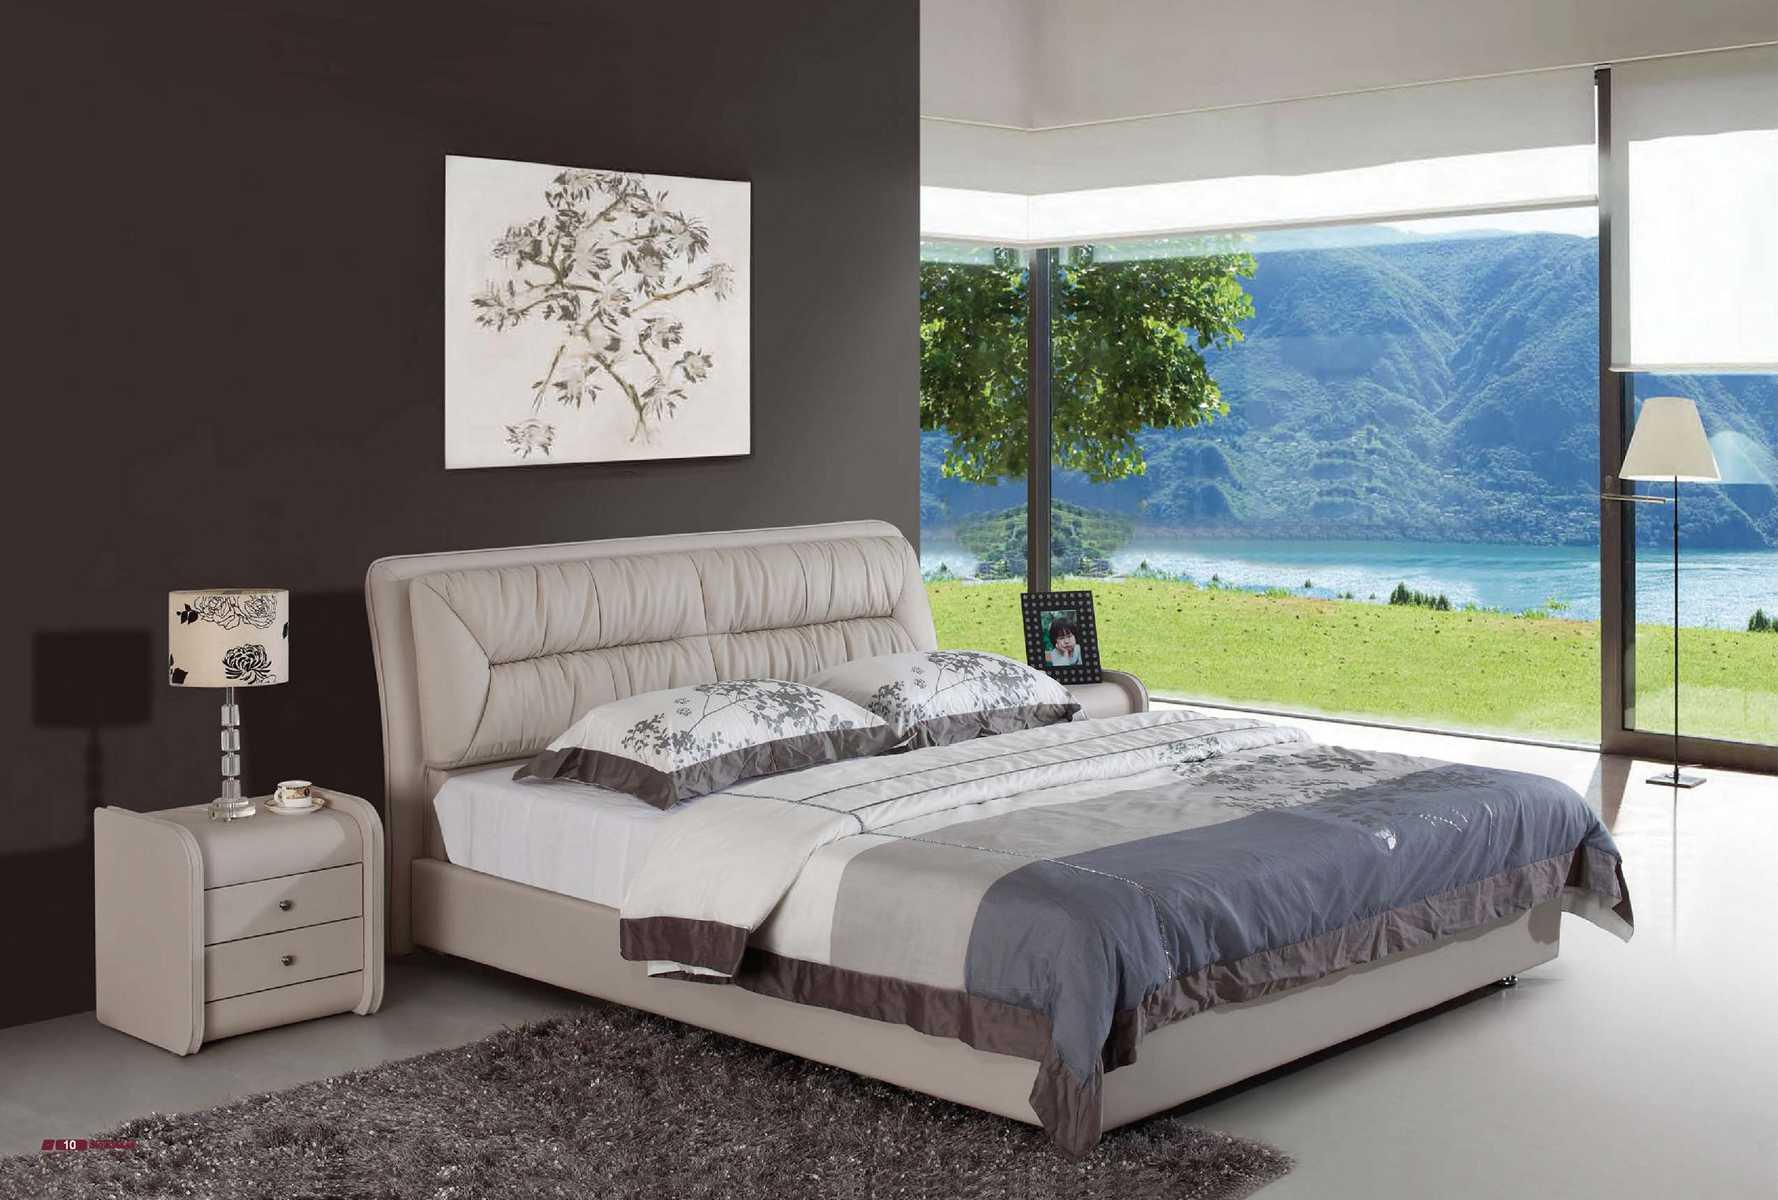 design betten in hochwertiger qualit t oder rundbett wts 9175 bei jv m bel. Black Bedroom Furniture Sets. Home Design Ideas